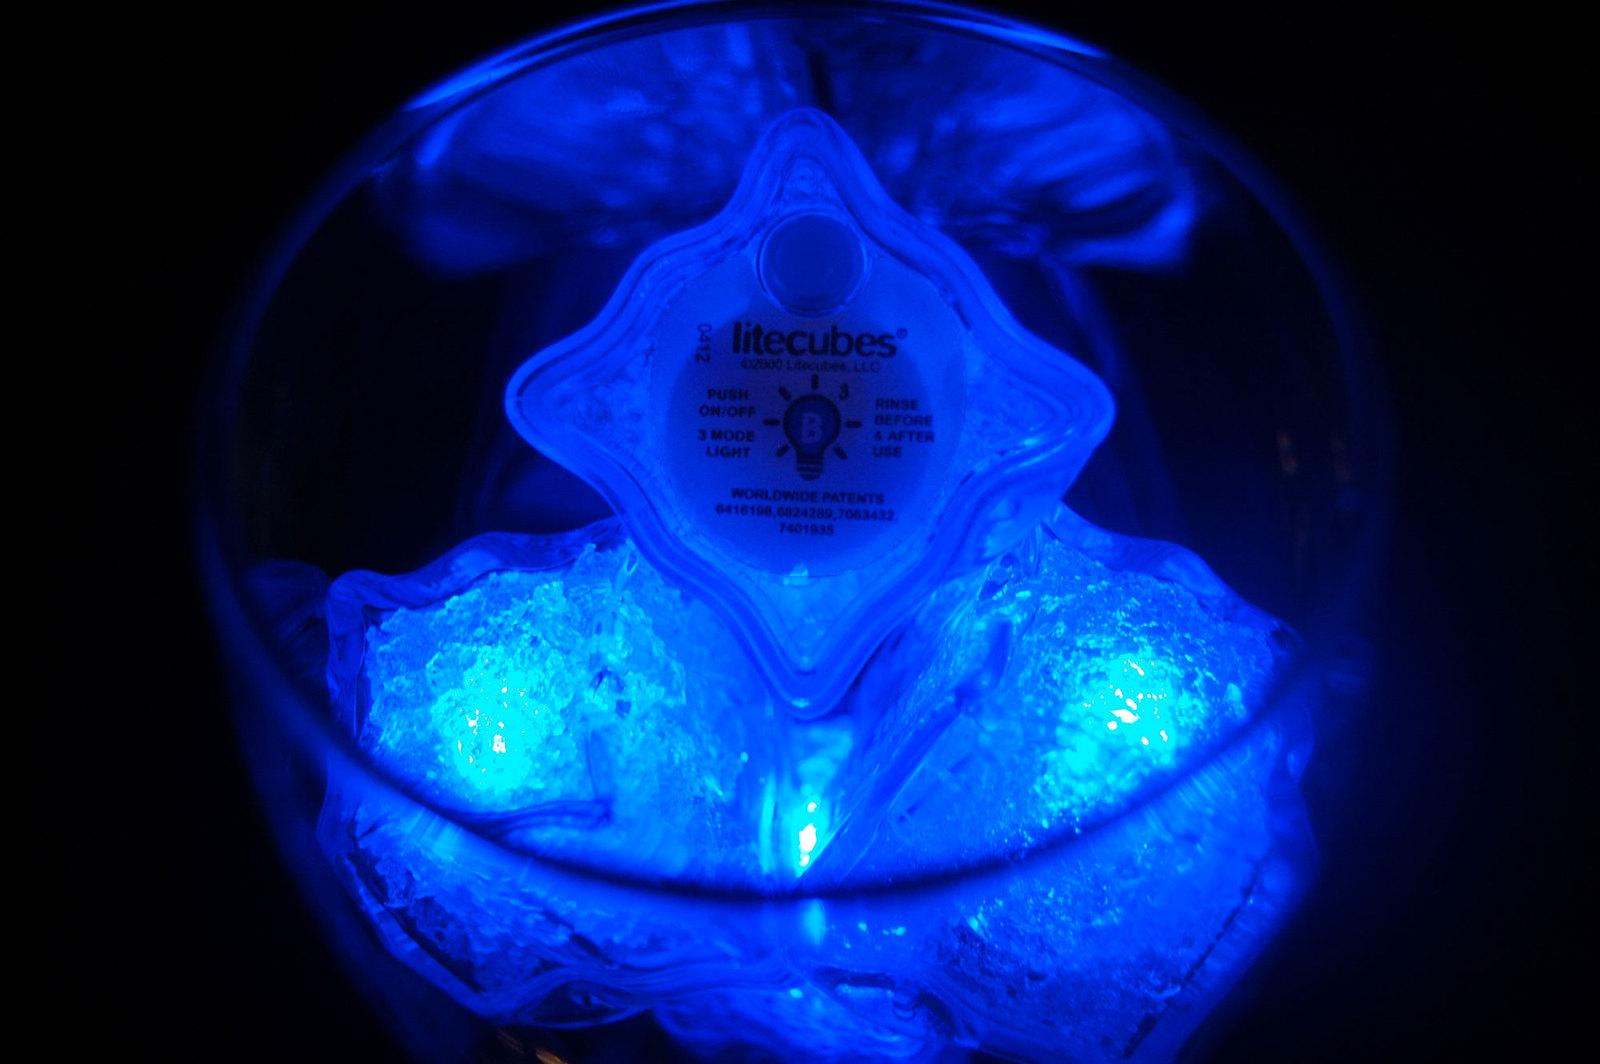 Set of 8 Litecubes Jewel Color Tinted Sapphire Blue Light up LED Ice Cubes